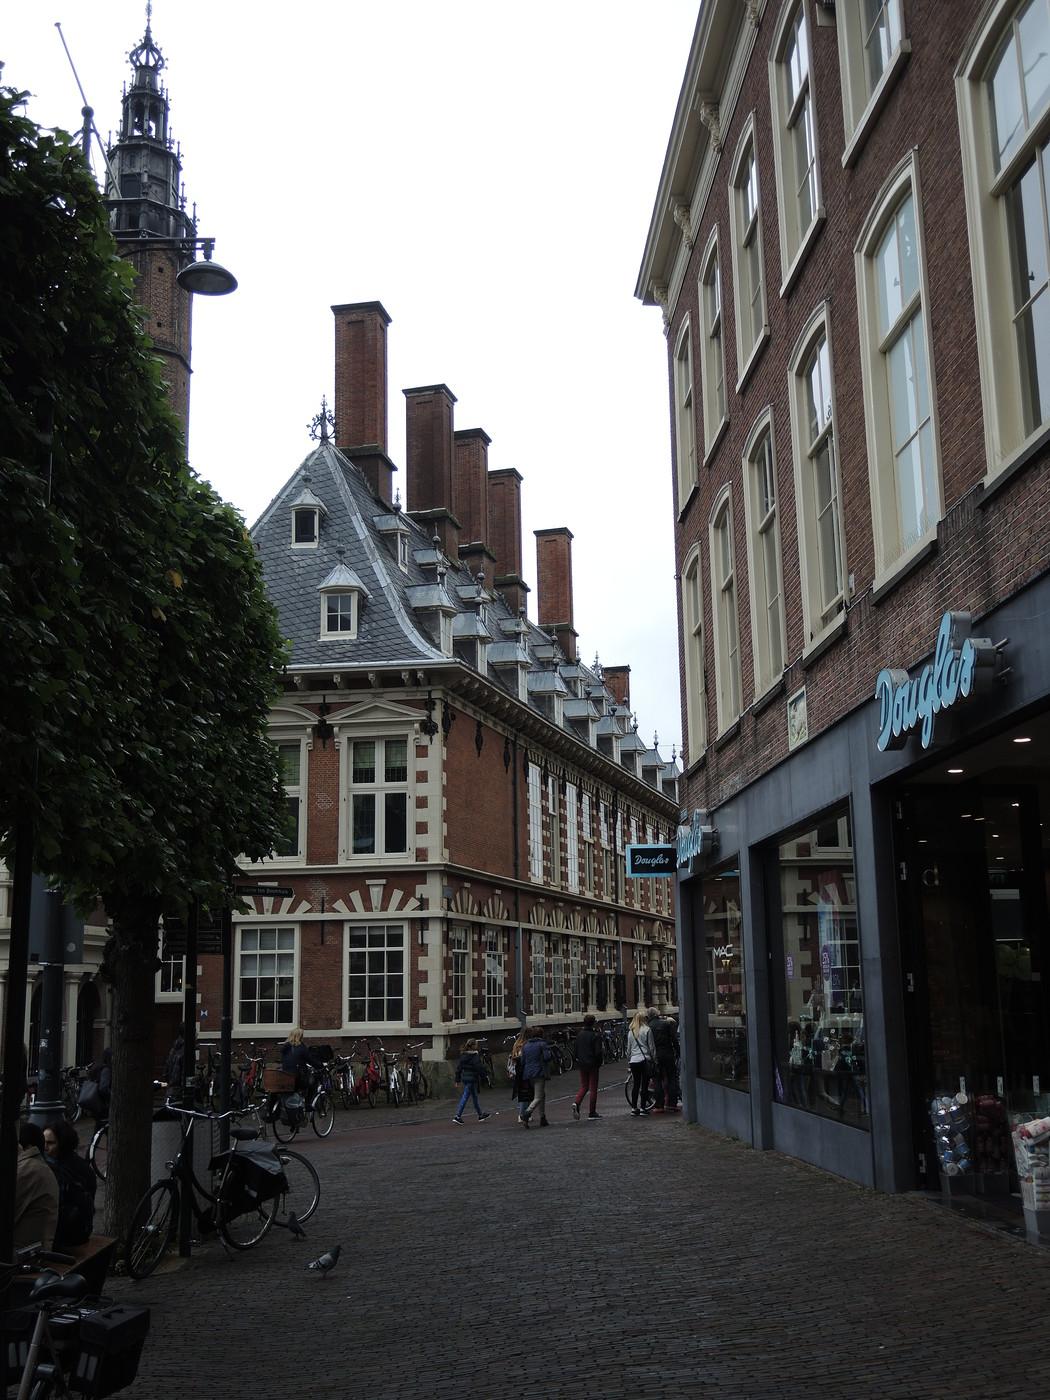 20151007 143226_Haarlem.jpg